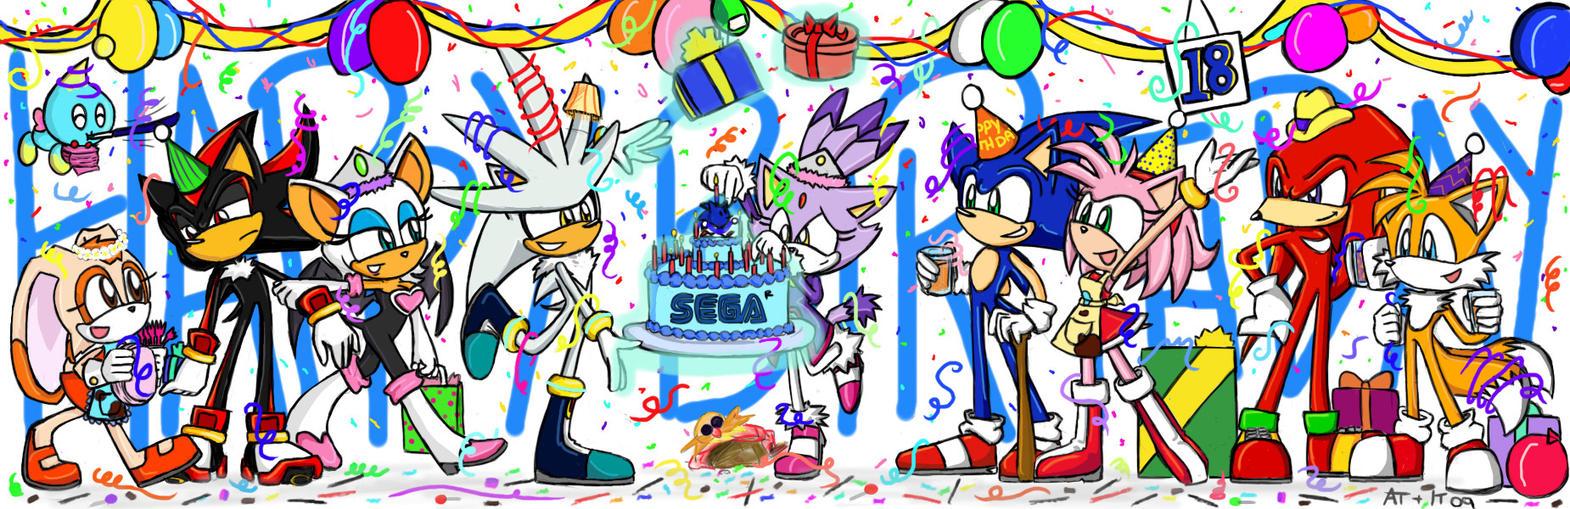 Sonic's 18th Birthday by SonicFF